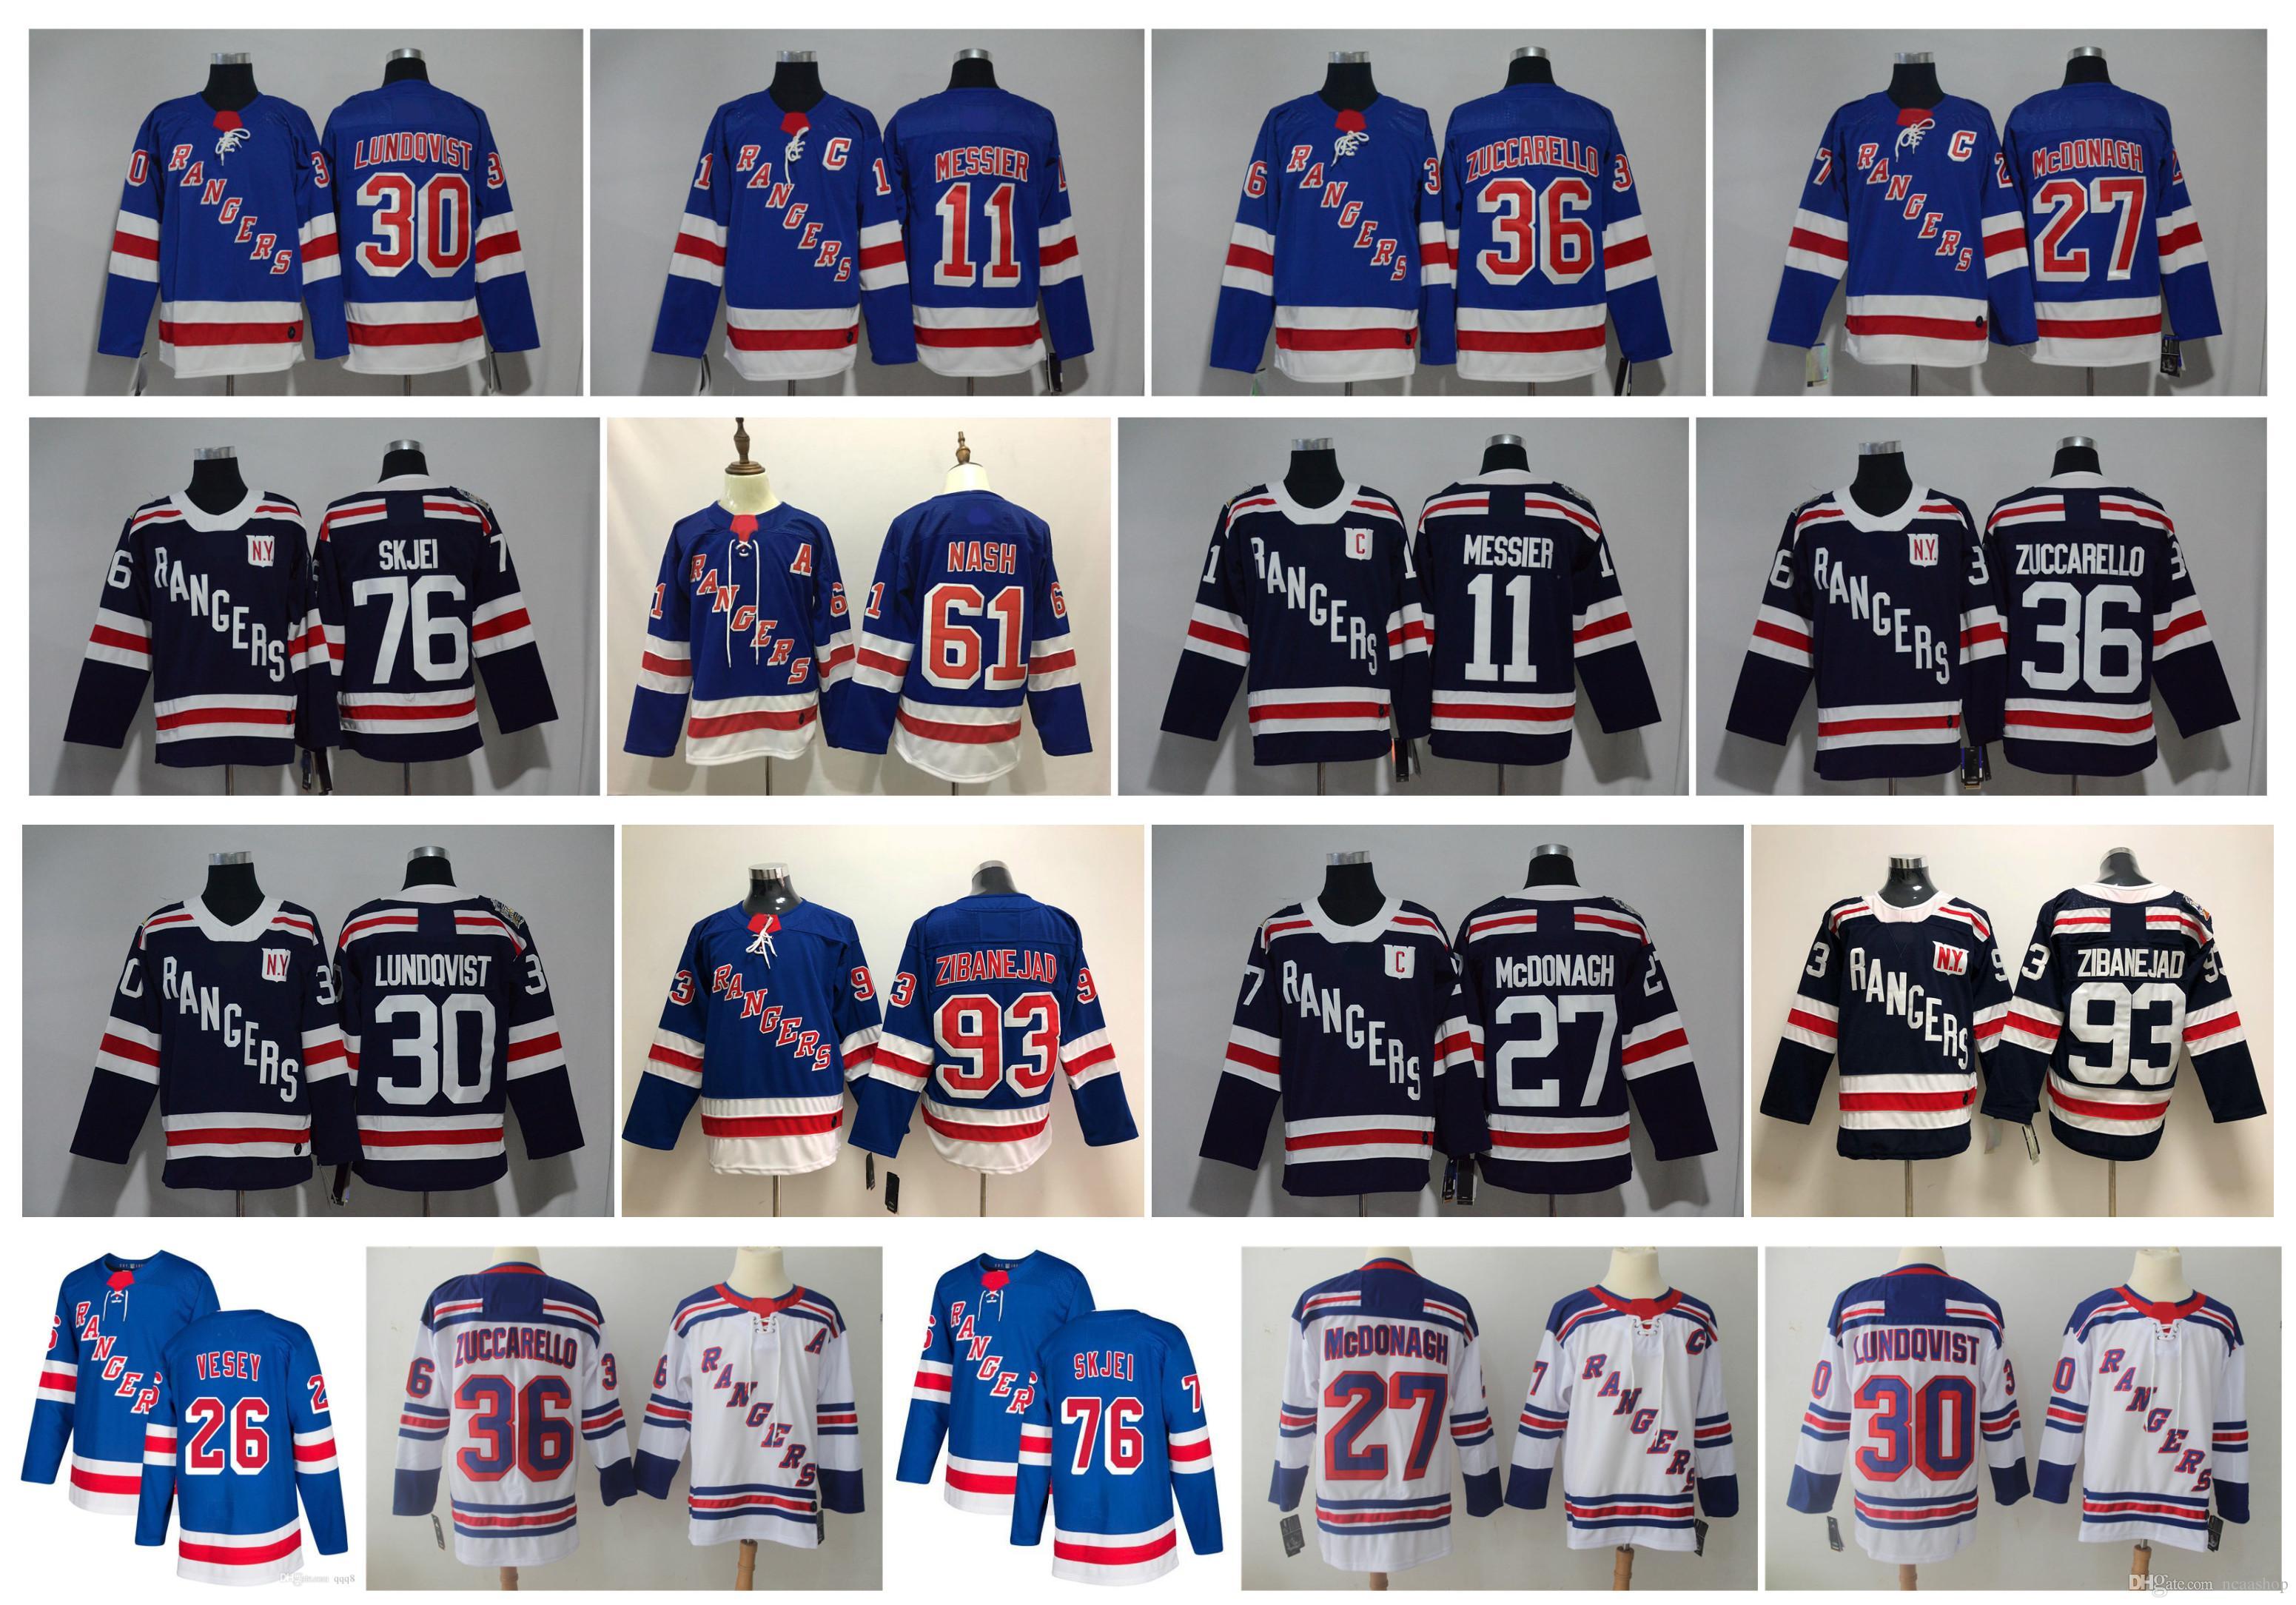 2019 NHL NY New York Rangers Jersey Henrik Lundqvist 36 Mats Zuccarello 76  Brady Skjei 93 Mika Zibanejad Rick Nash Ryan McDonagh Messier Hockey From  ... 8efd2249f